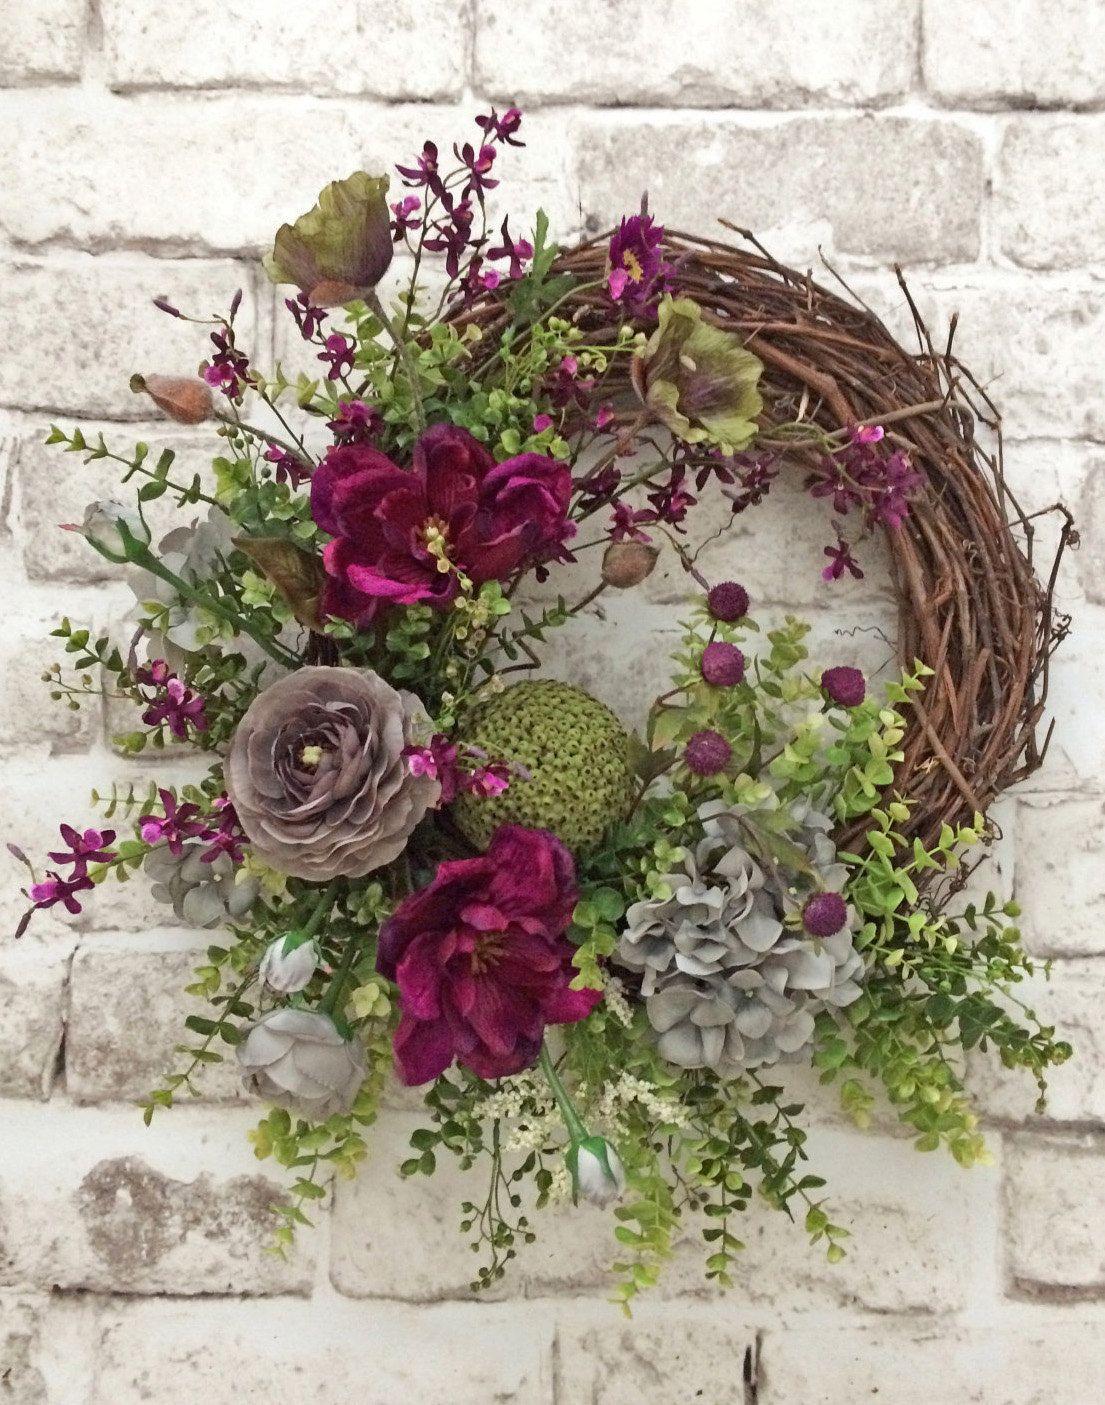 Summer Door Wreath Front For Outdoor Spring Silk Fl Grapevine Decoration